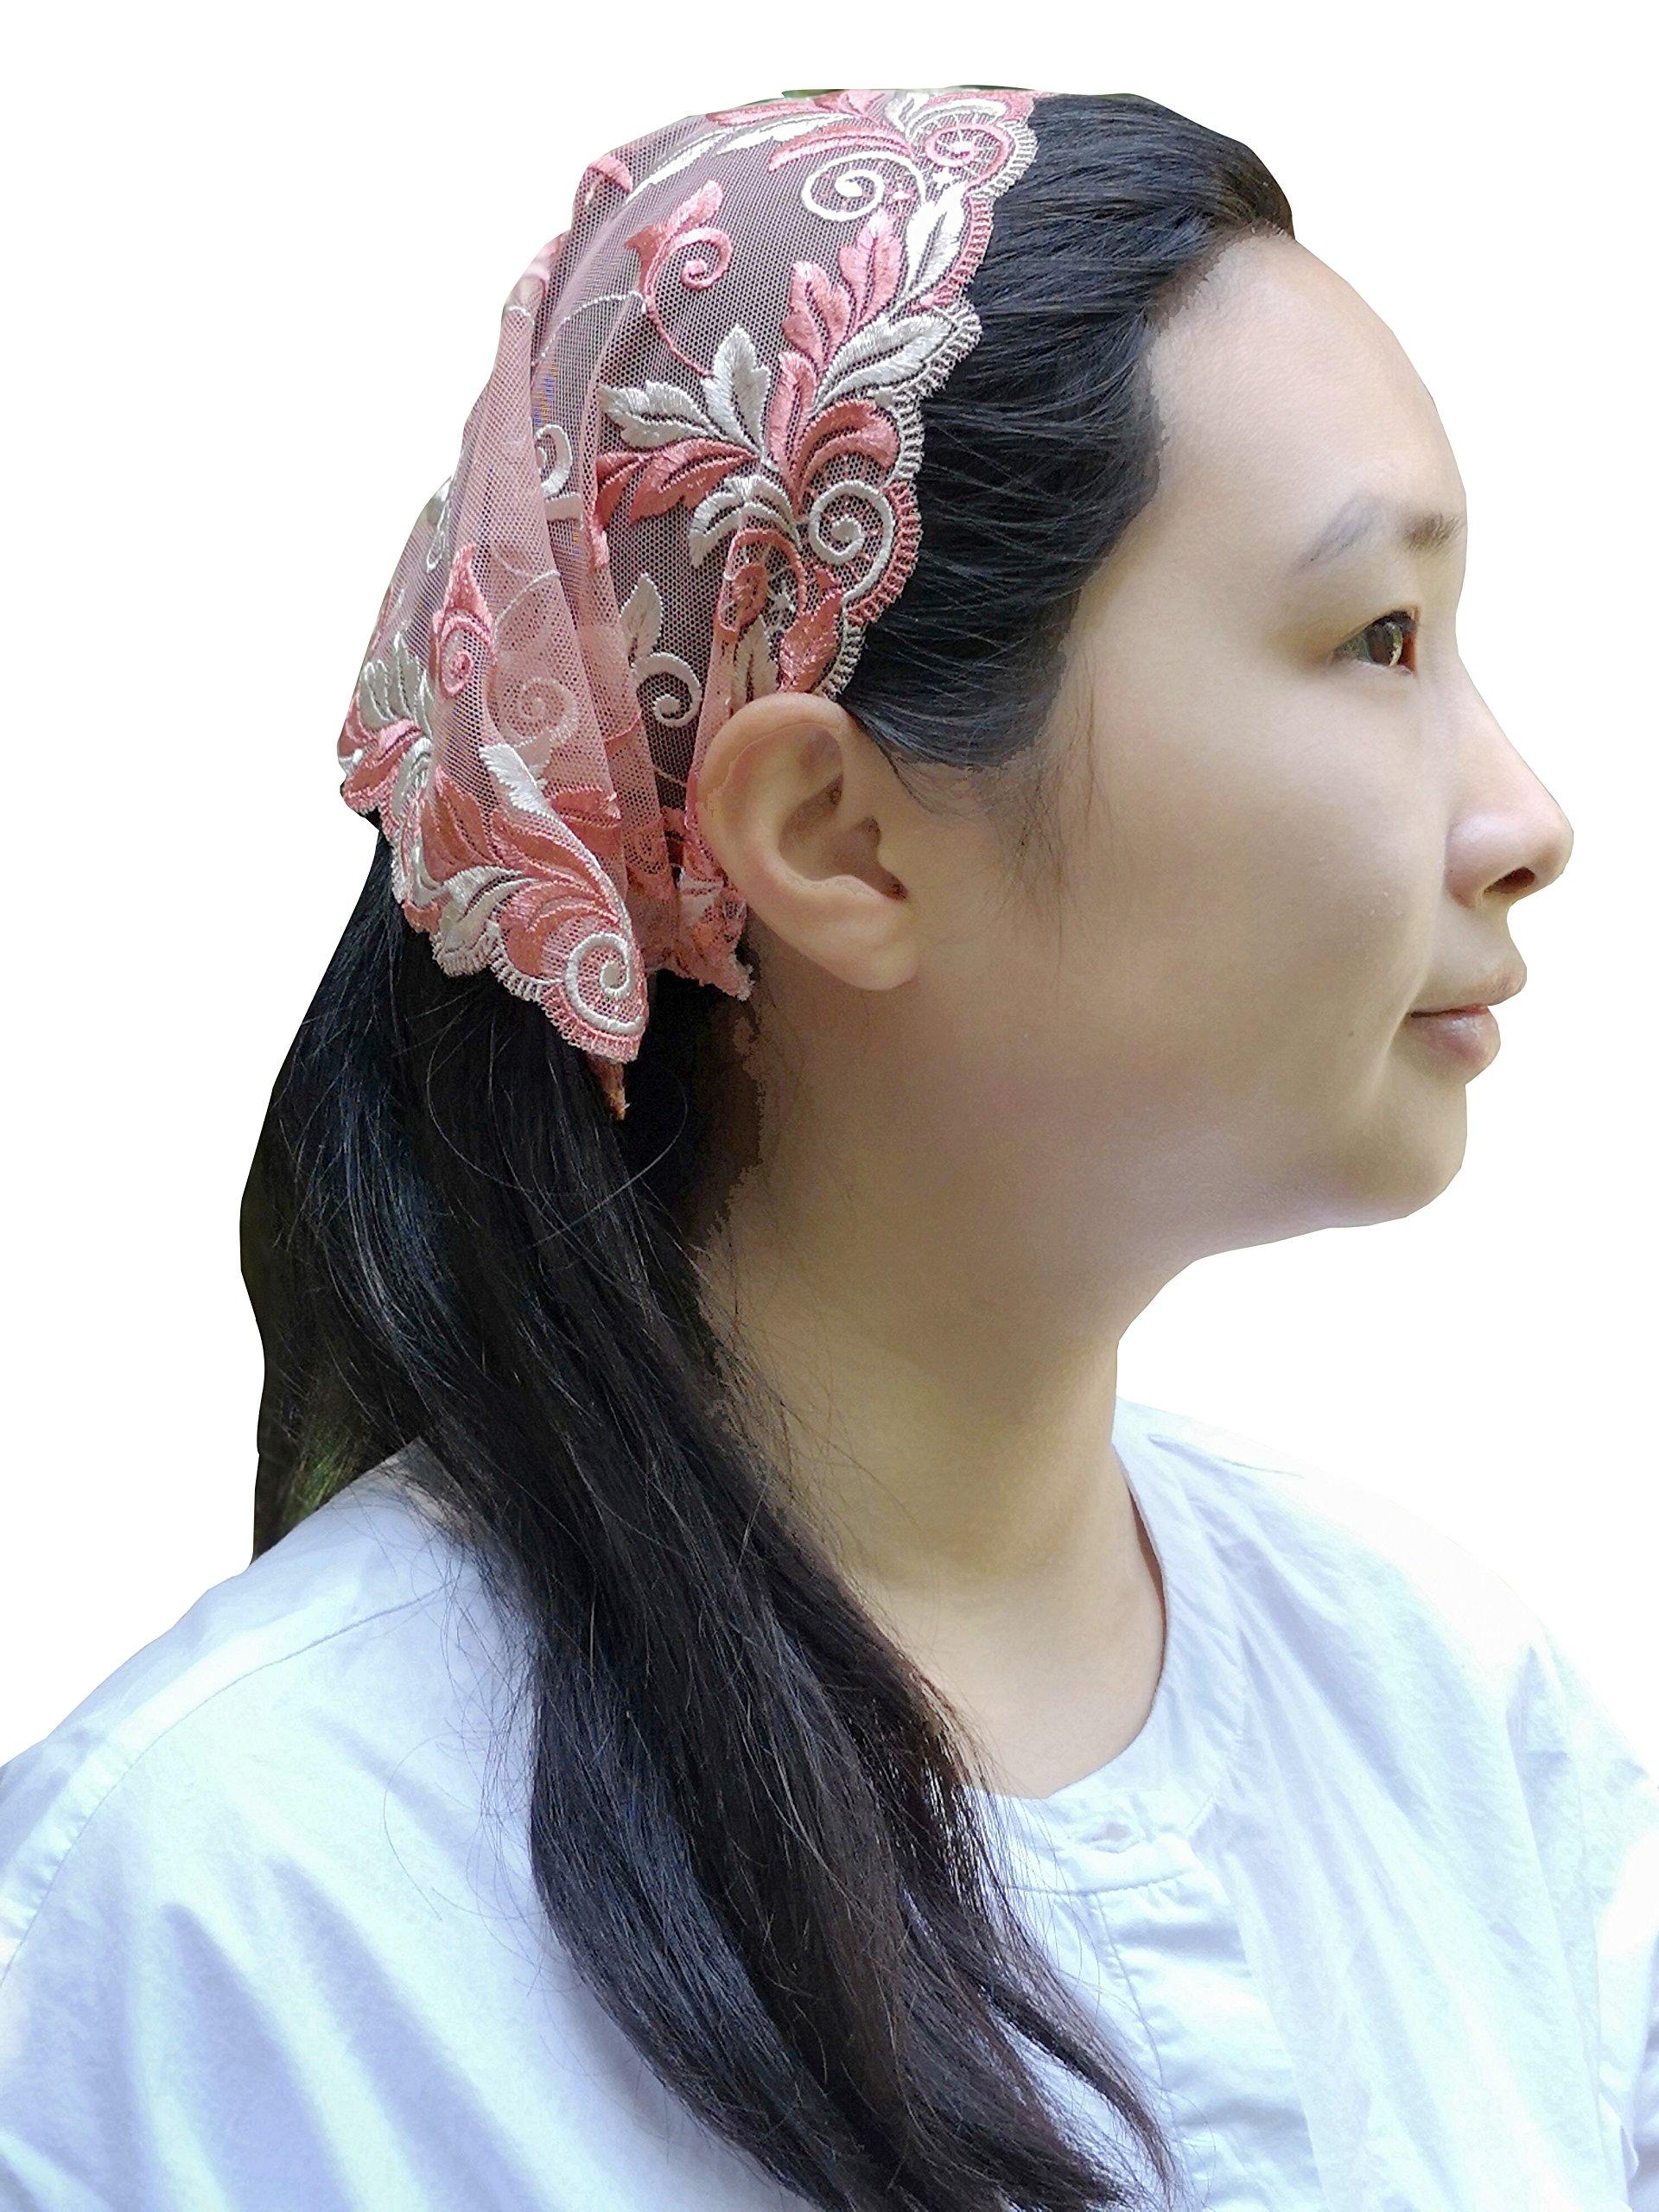 Soft Headwrap Lace Kerchief Tie-style Head Covering Church Veil Y030 (Blush)